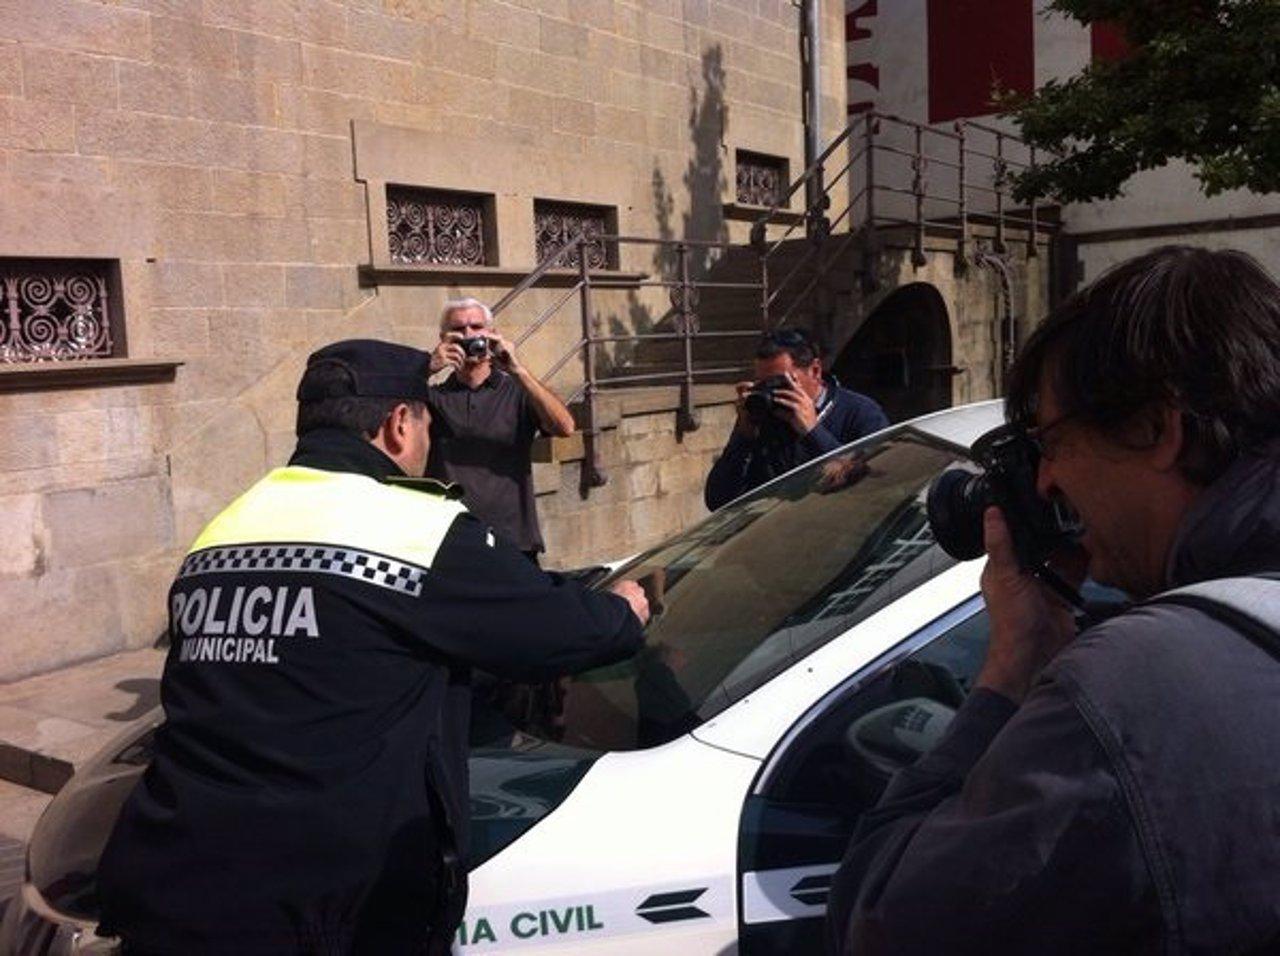 La Policía de Olot multa a un coche de la Guardia Civil